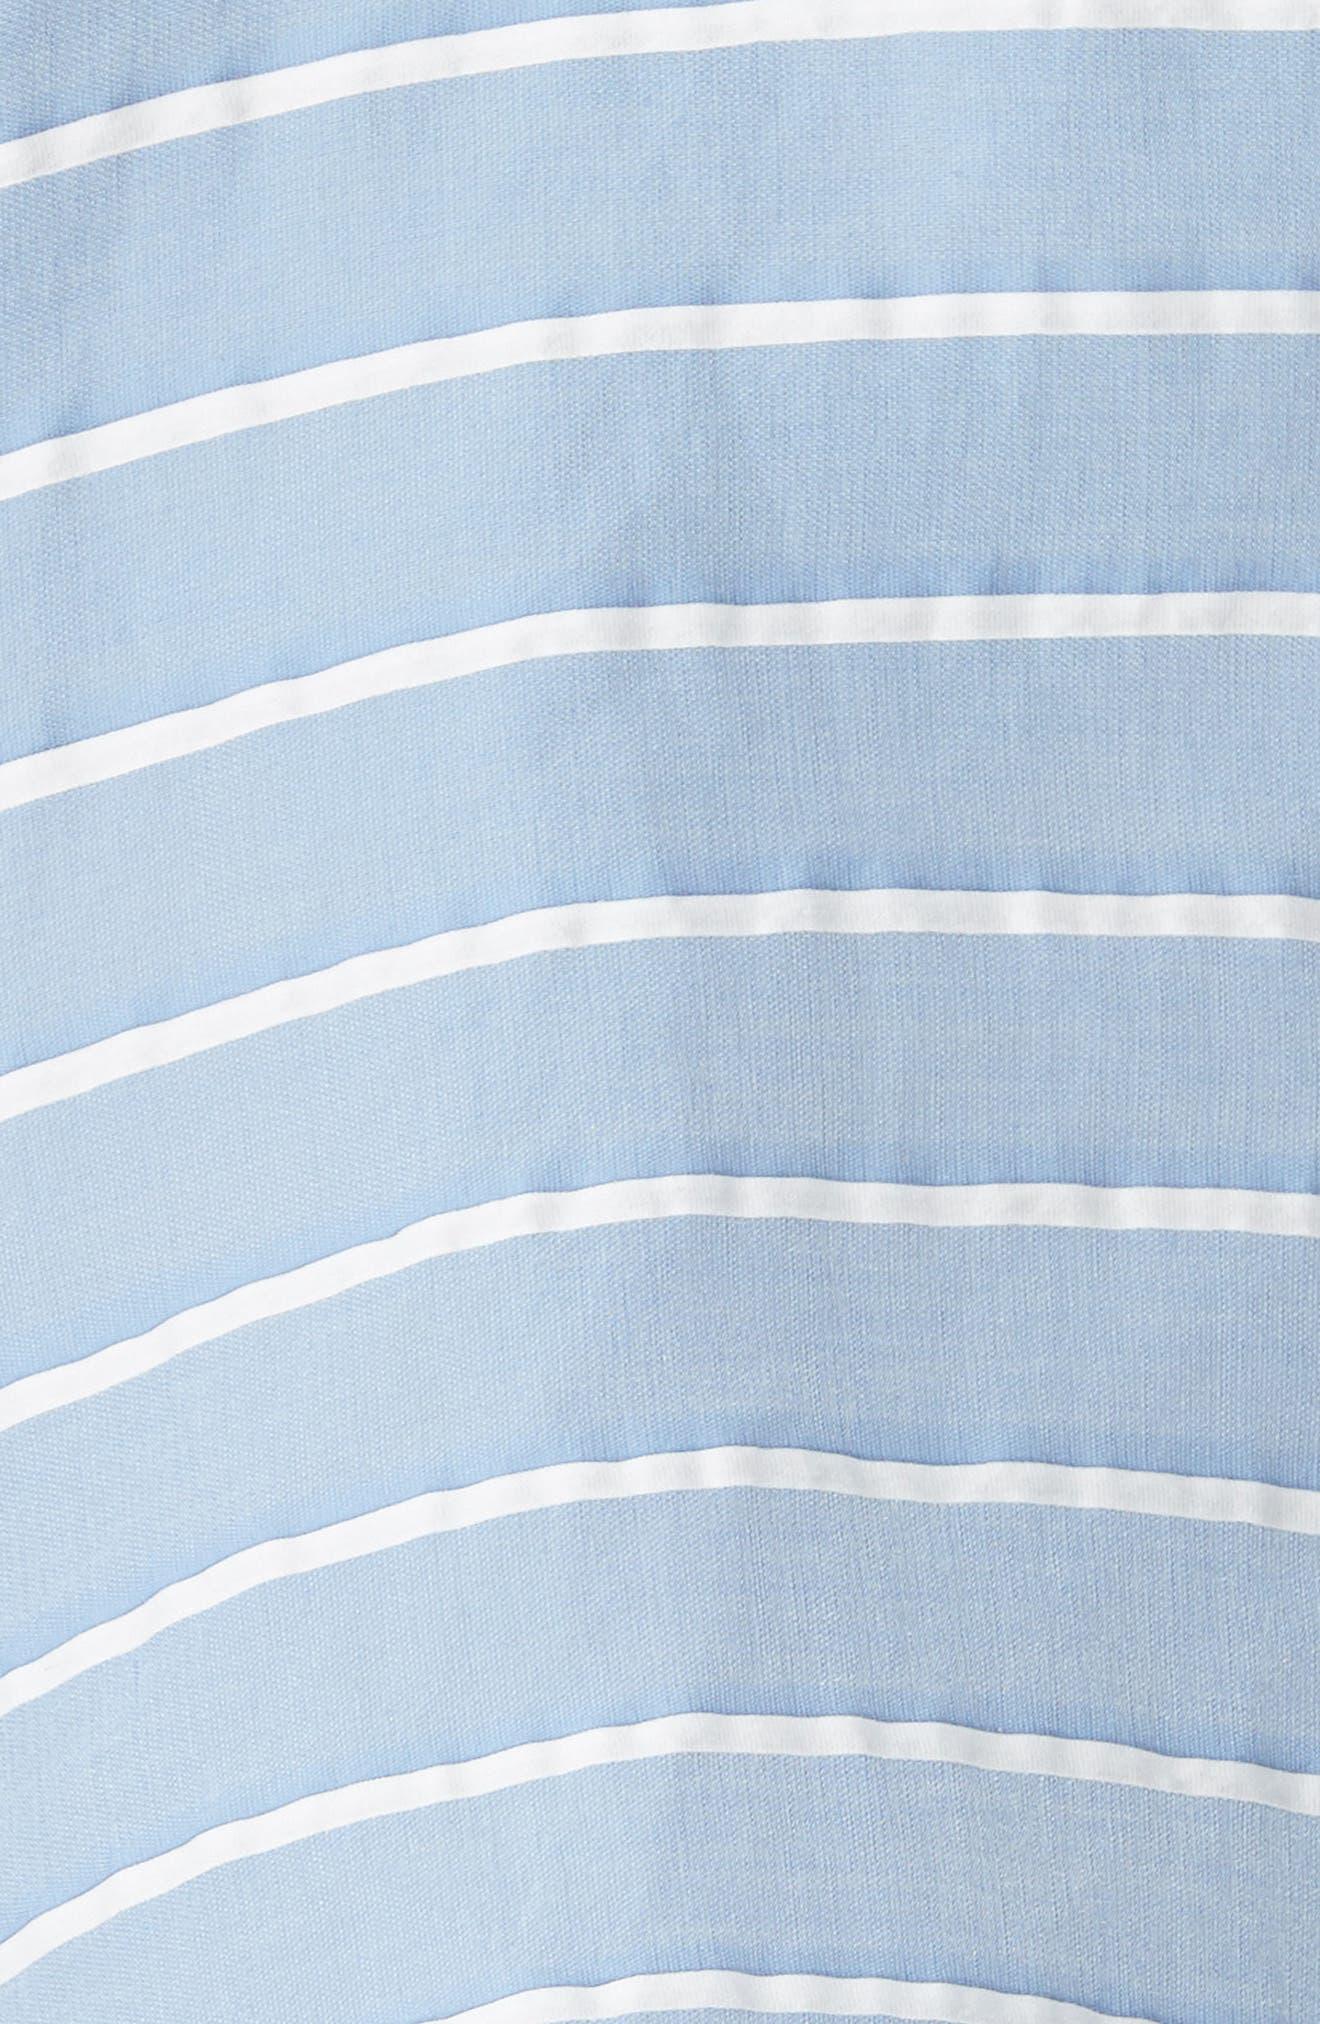 Lace Trim Asymmetrical Dress,                             Alternate thumbnail 5, color,